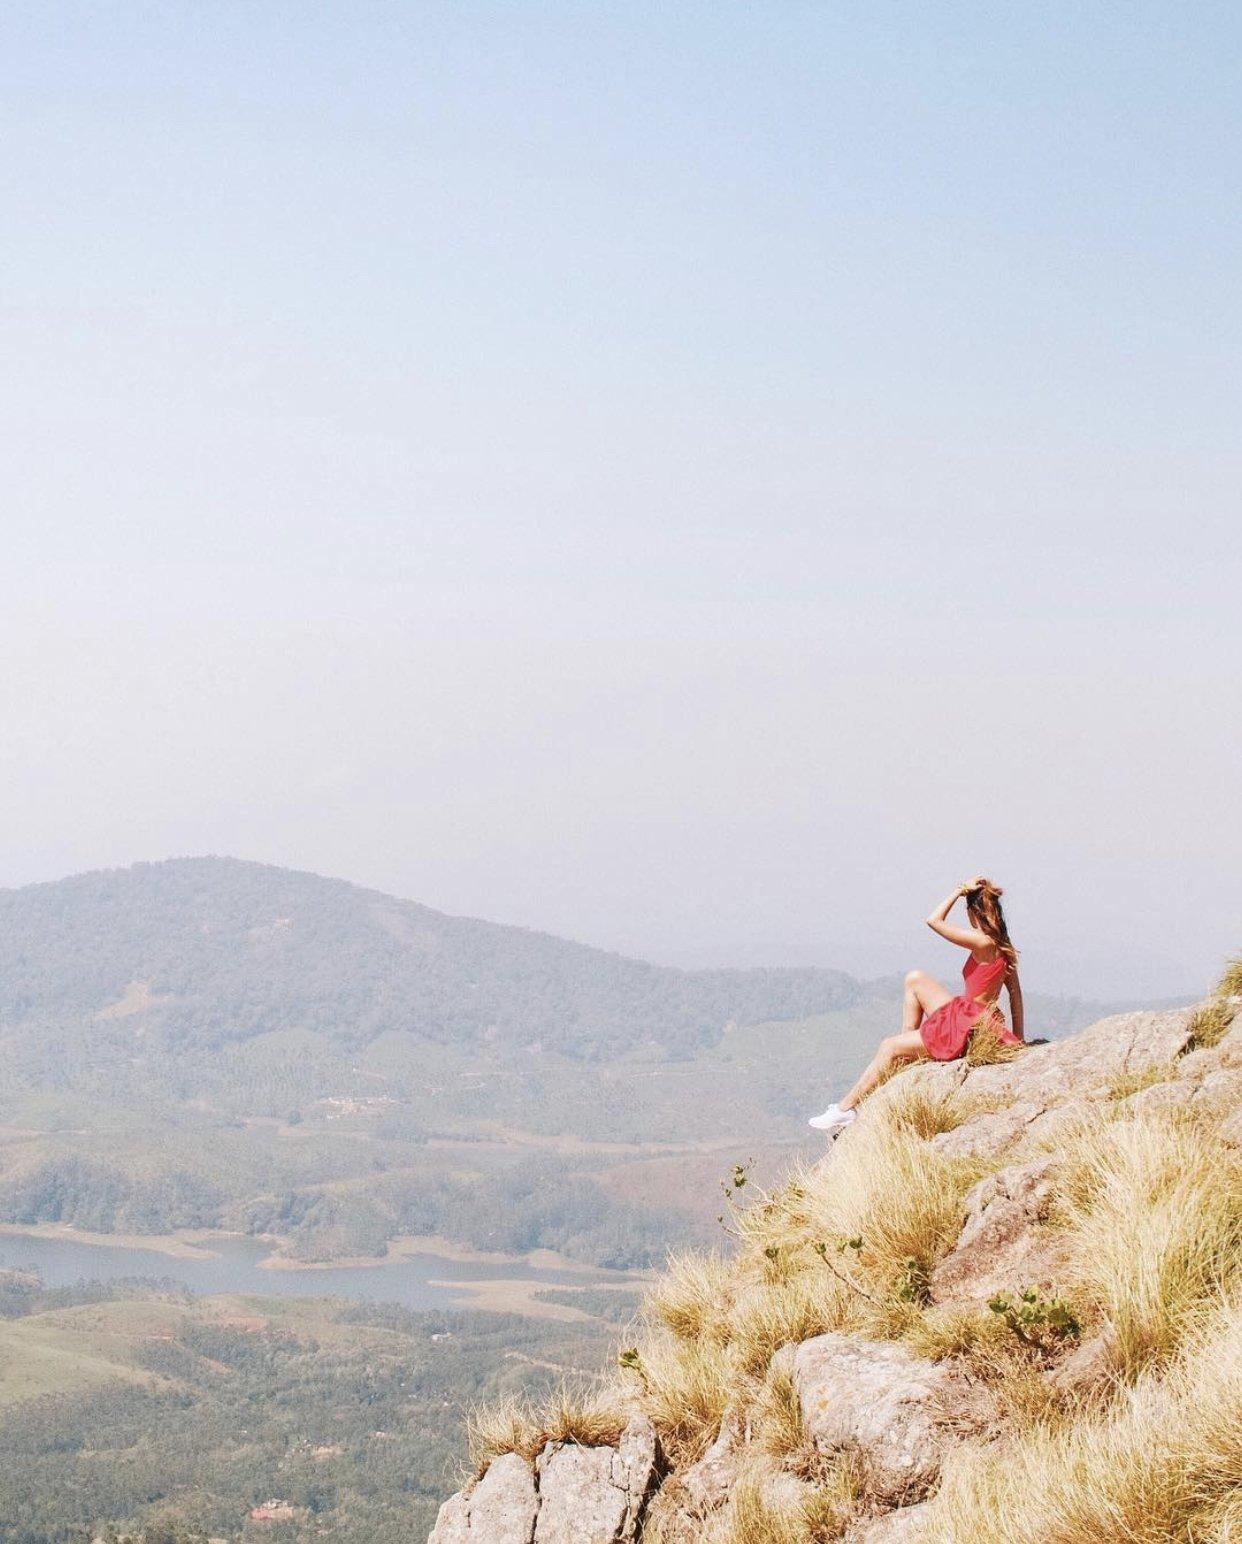 kerala munaar mountain